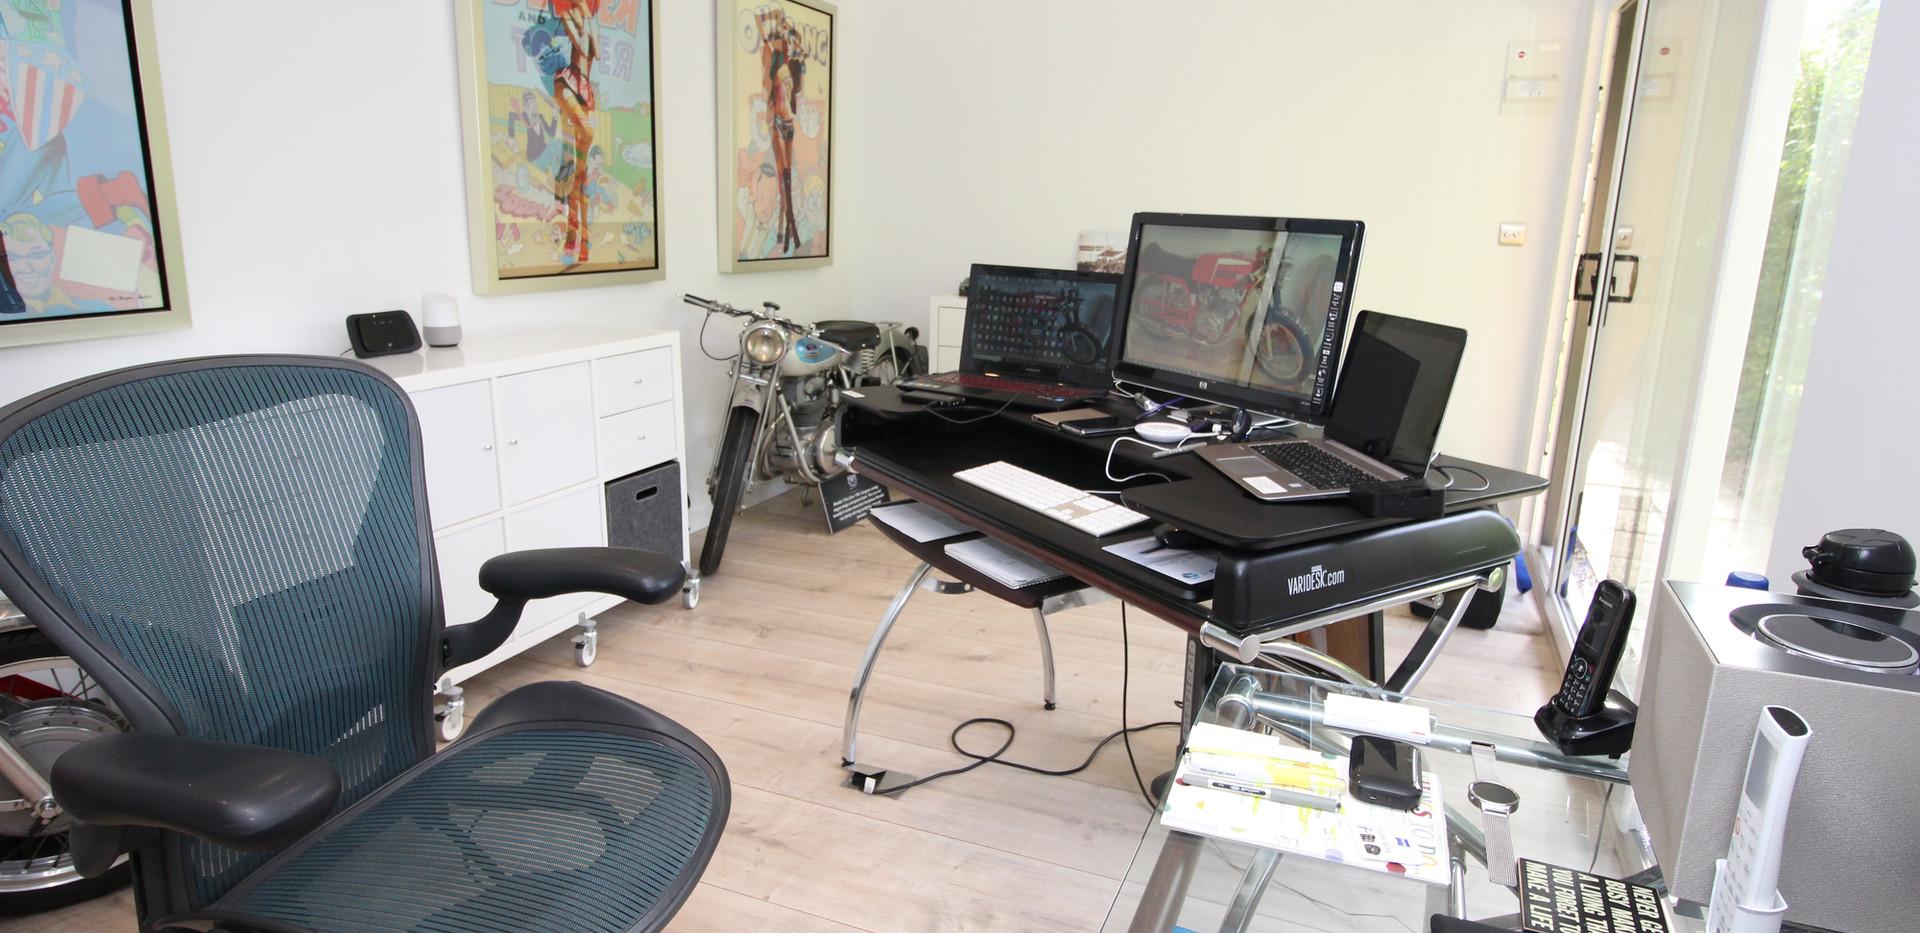 Inspiring Office Space